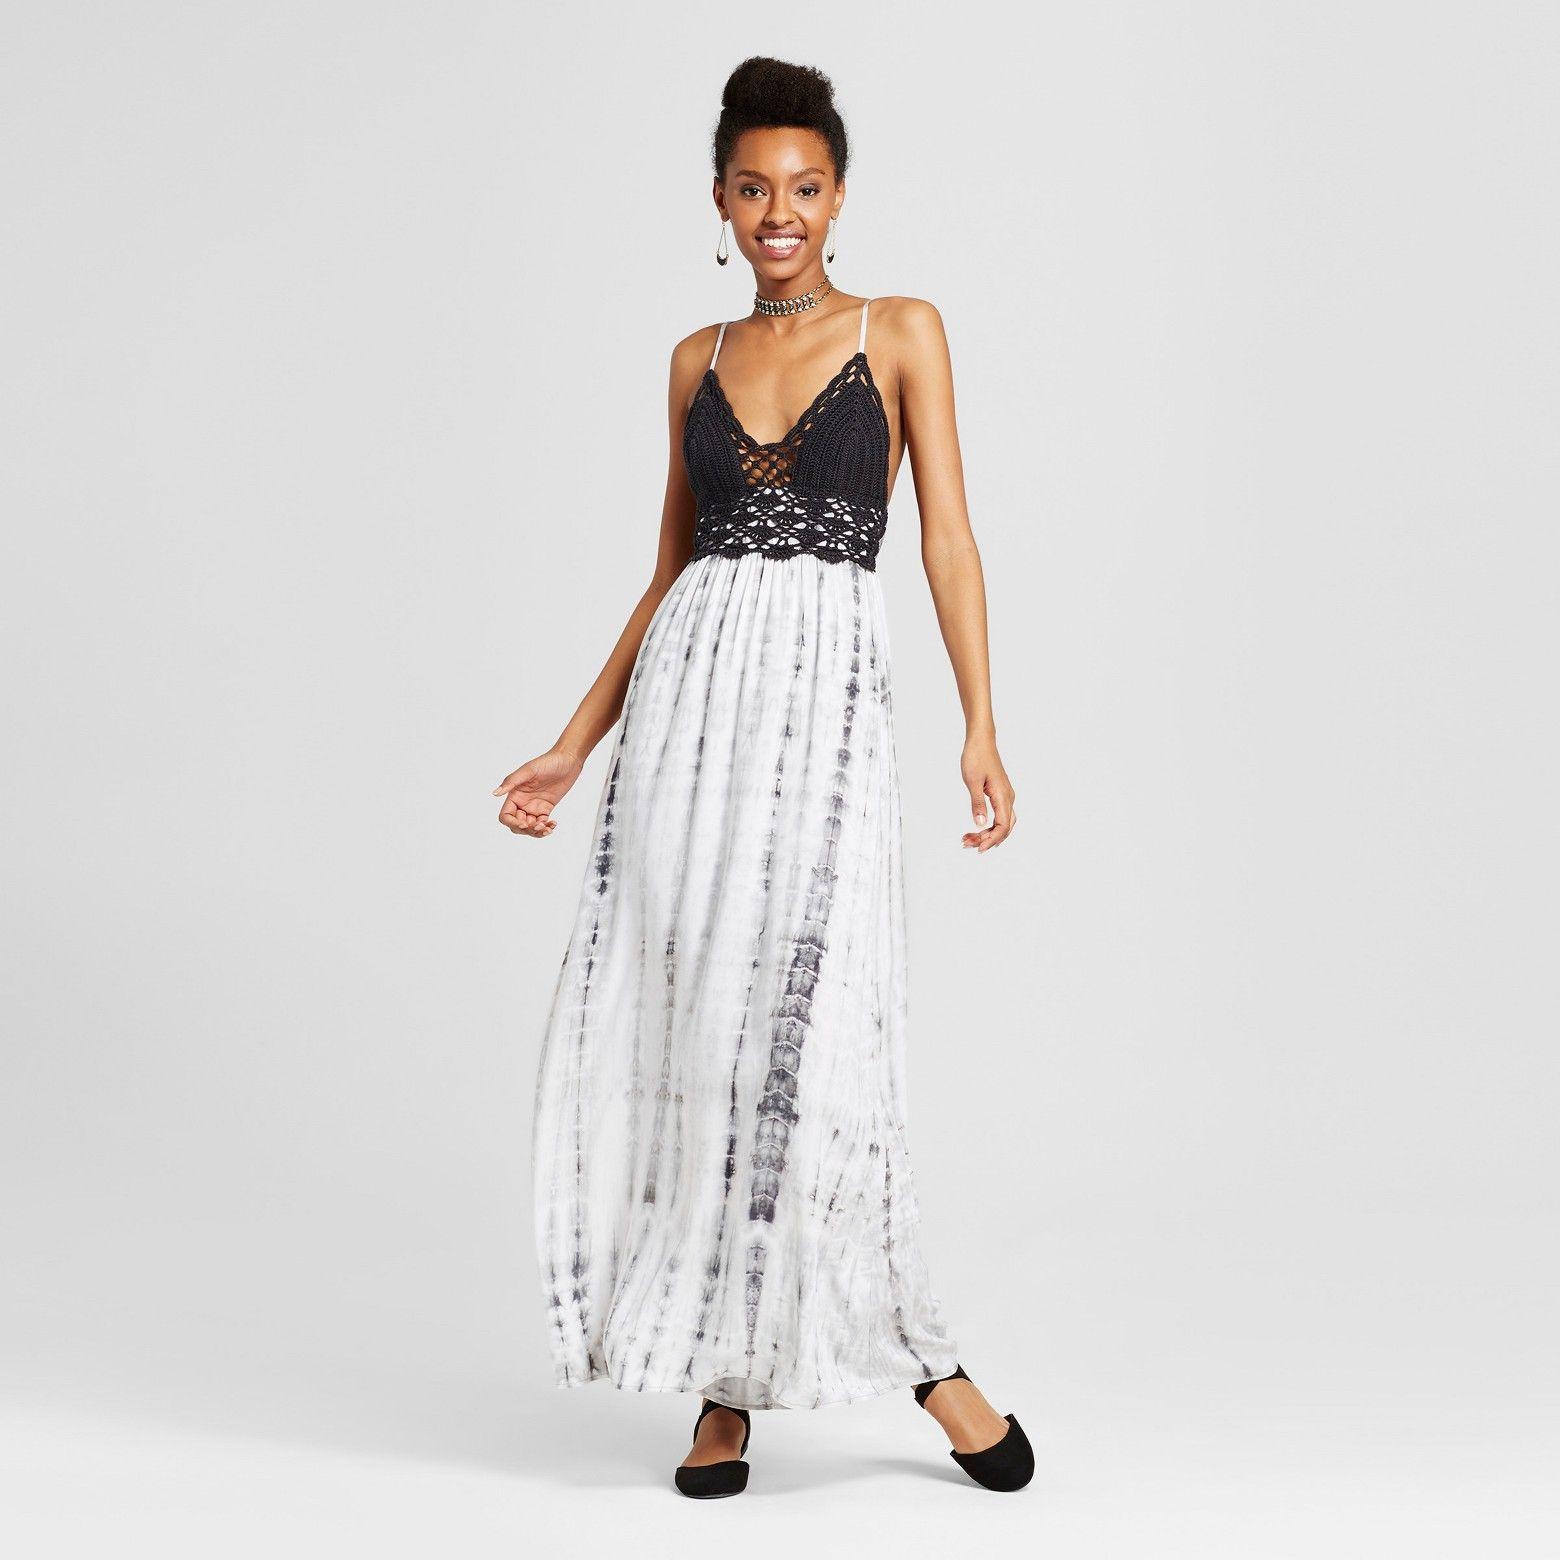 crochet bodice dress Dresses, Black maxi dress